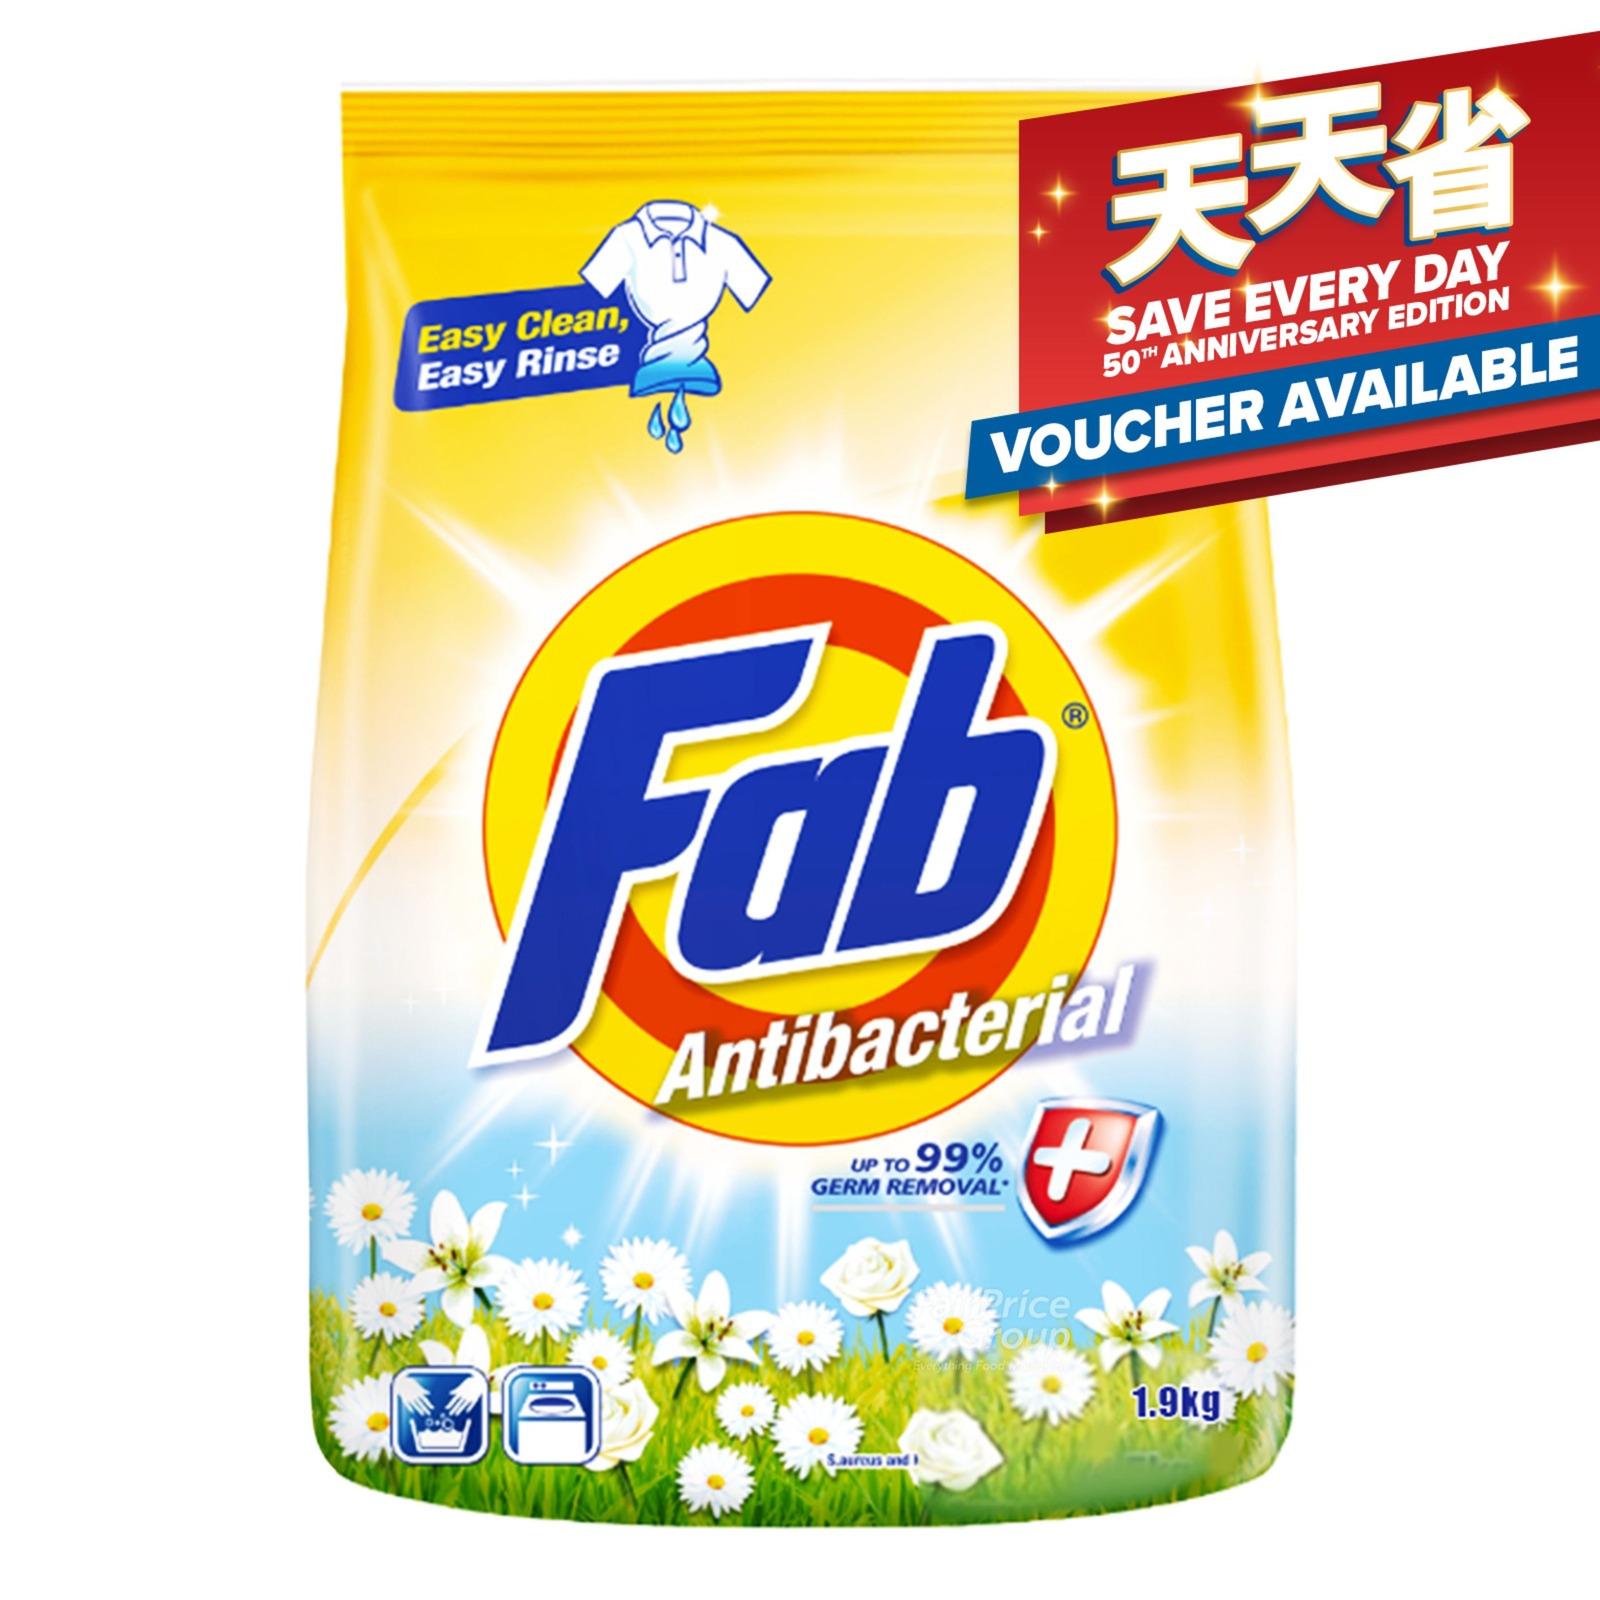 Fab Detergent Powder - Anti-Bacterial